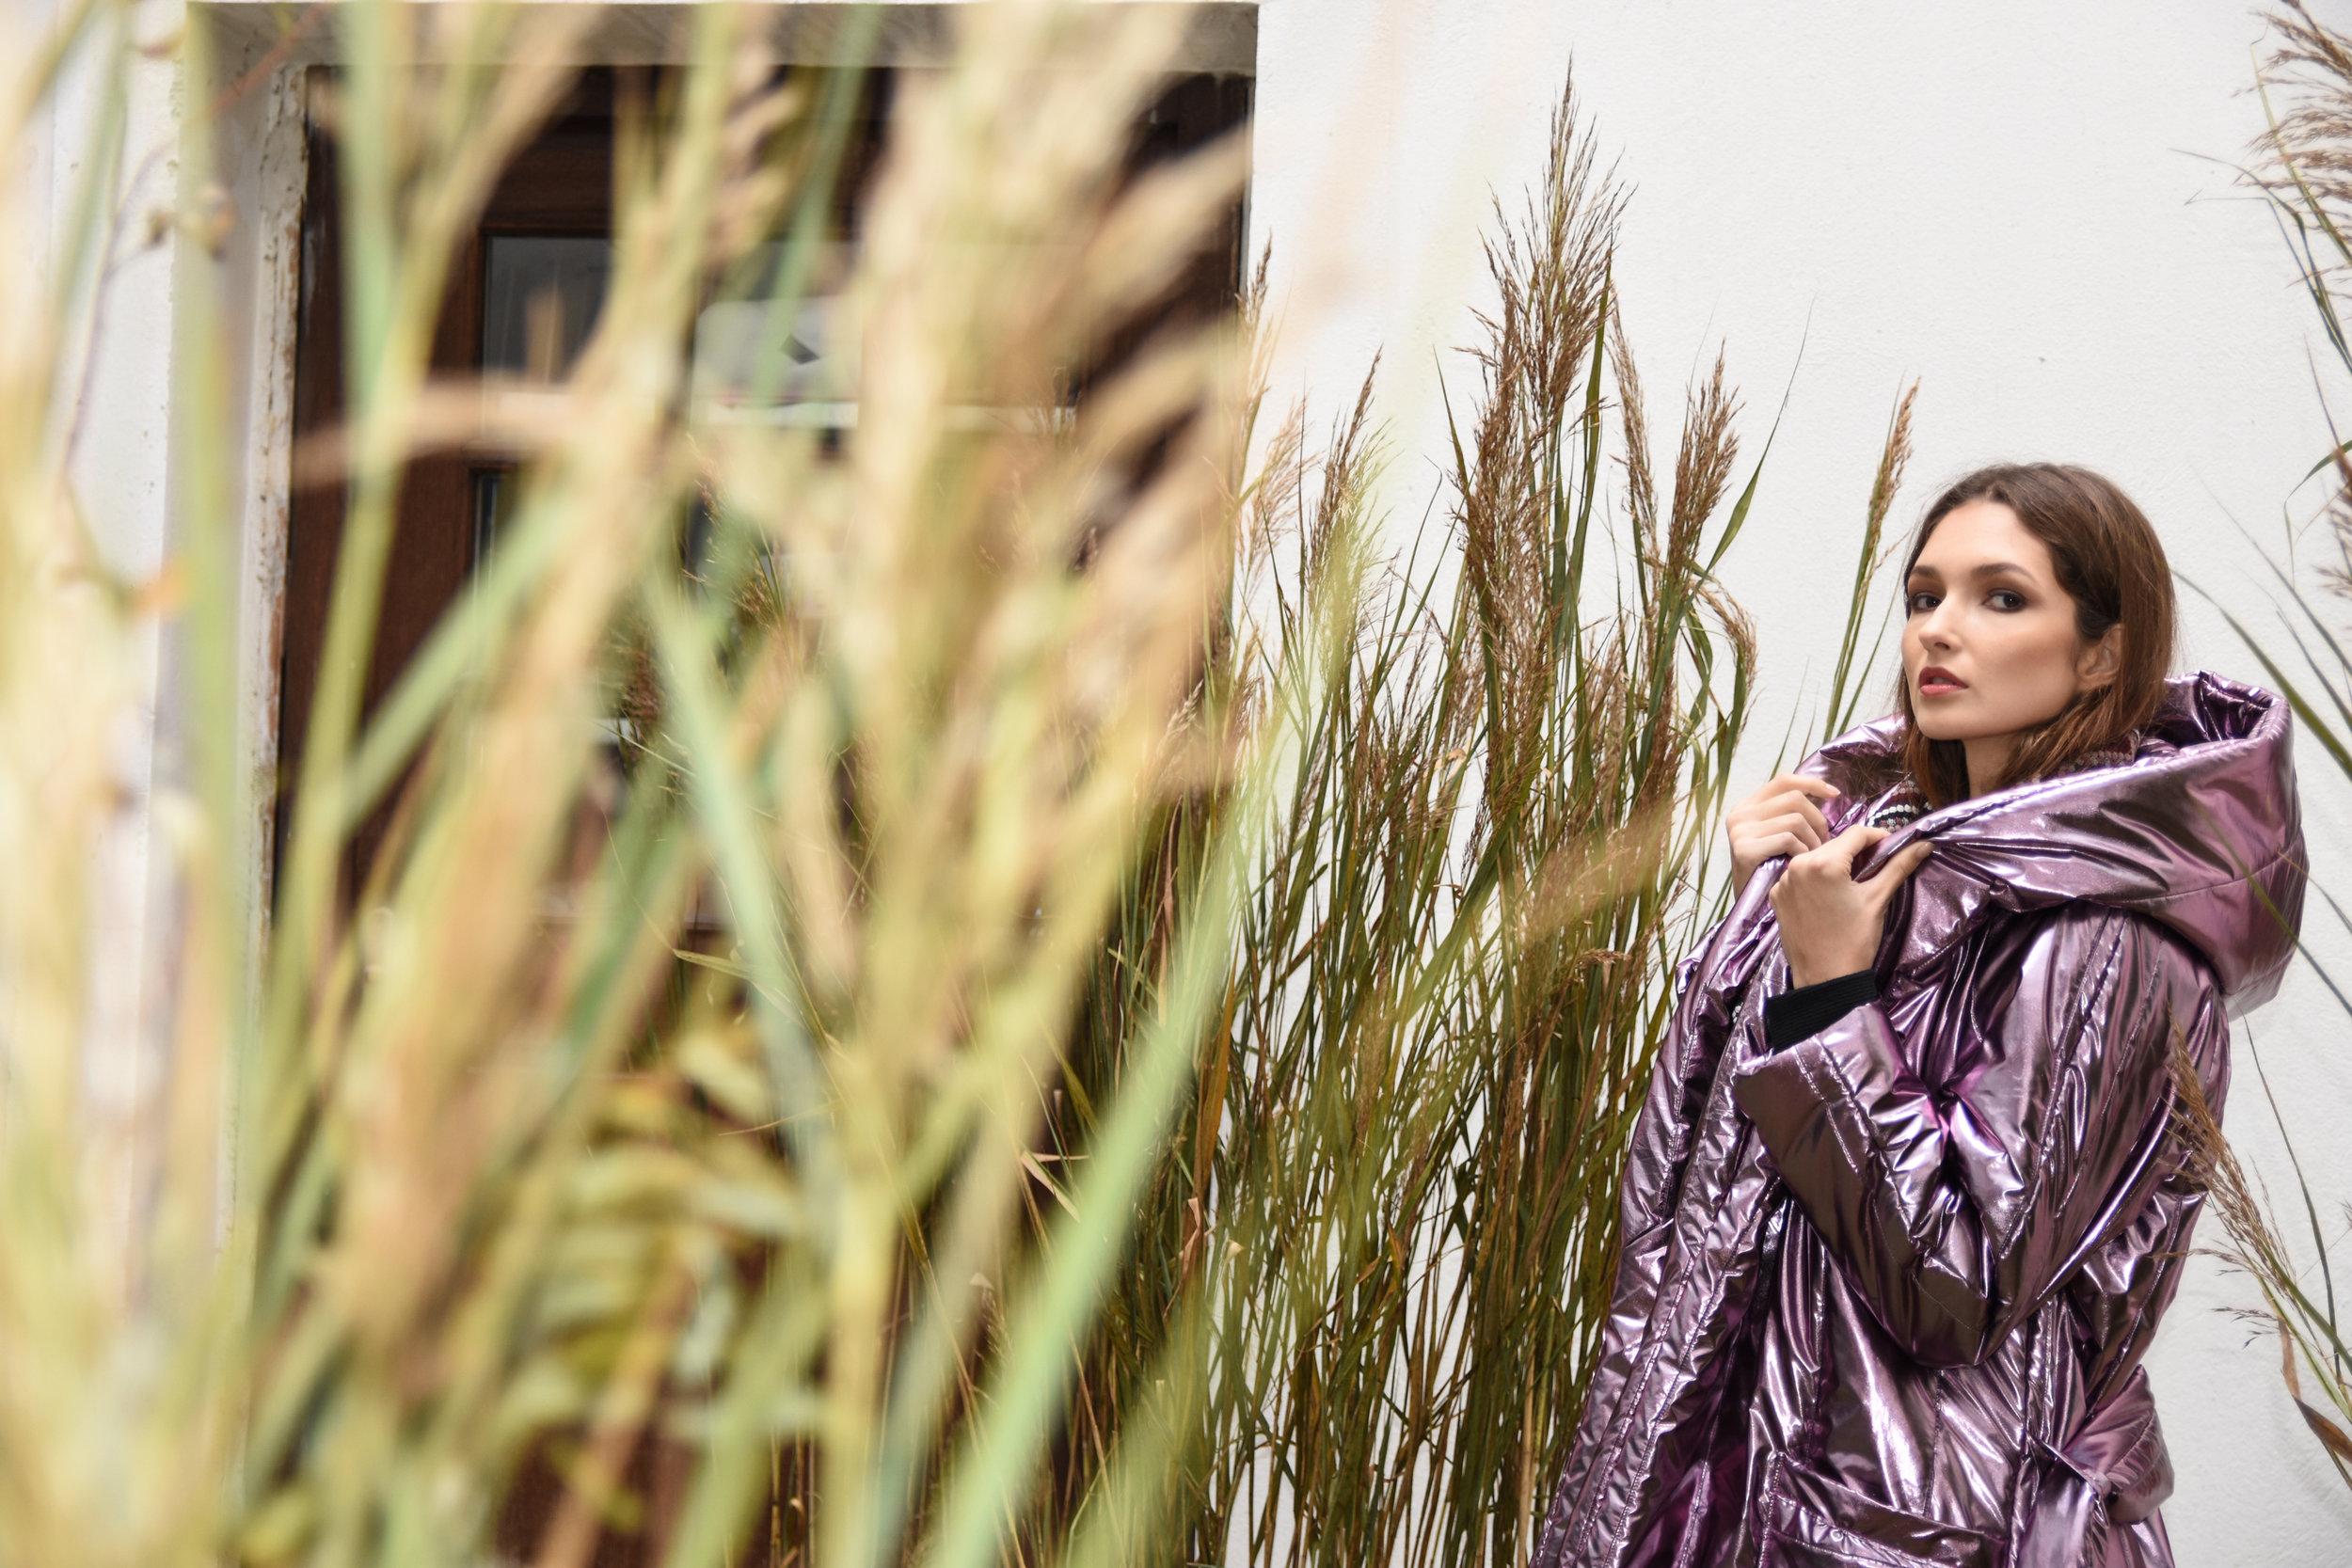 Julia Kaja Hrovat plašč 295 eur  JKH obleka 125 eur